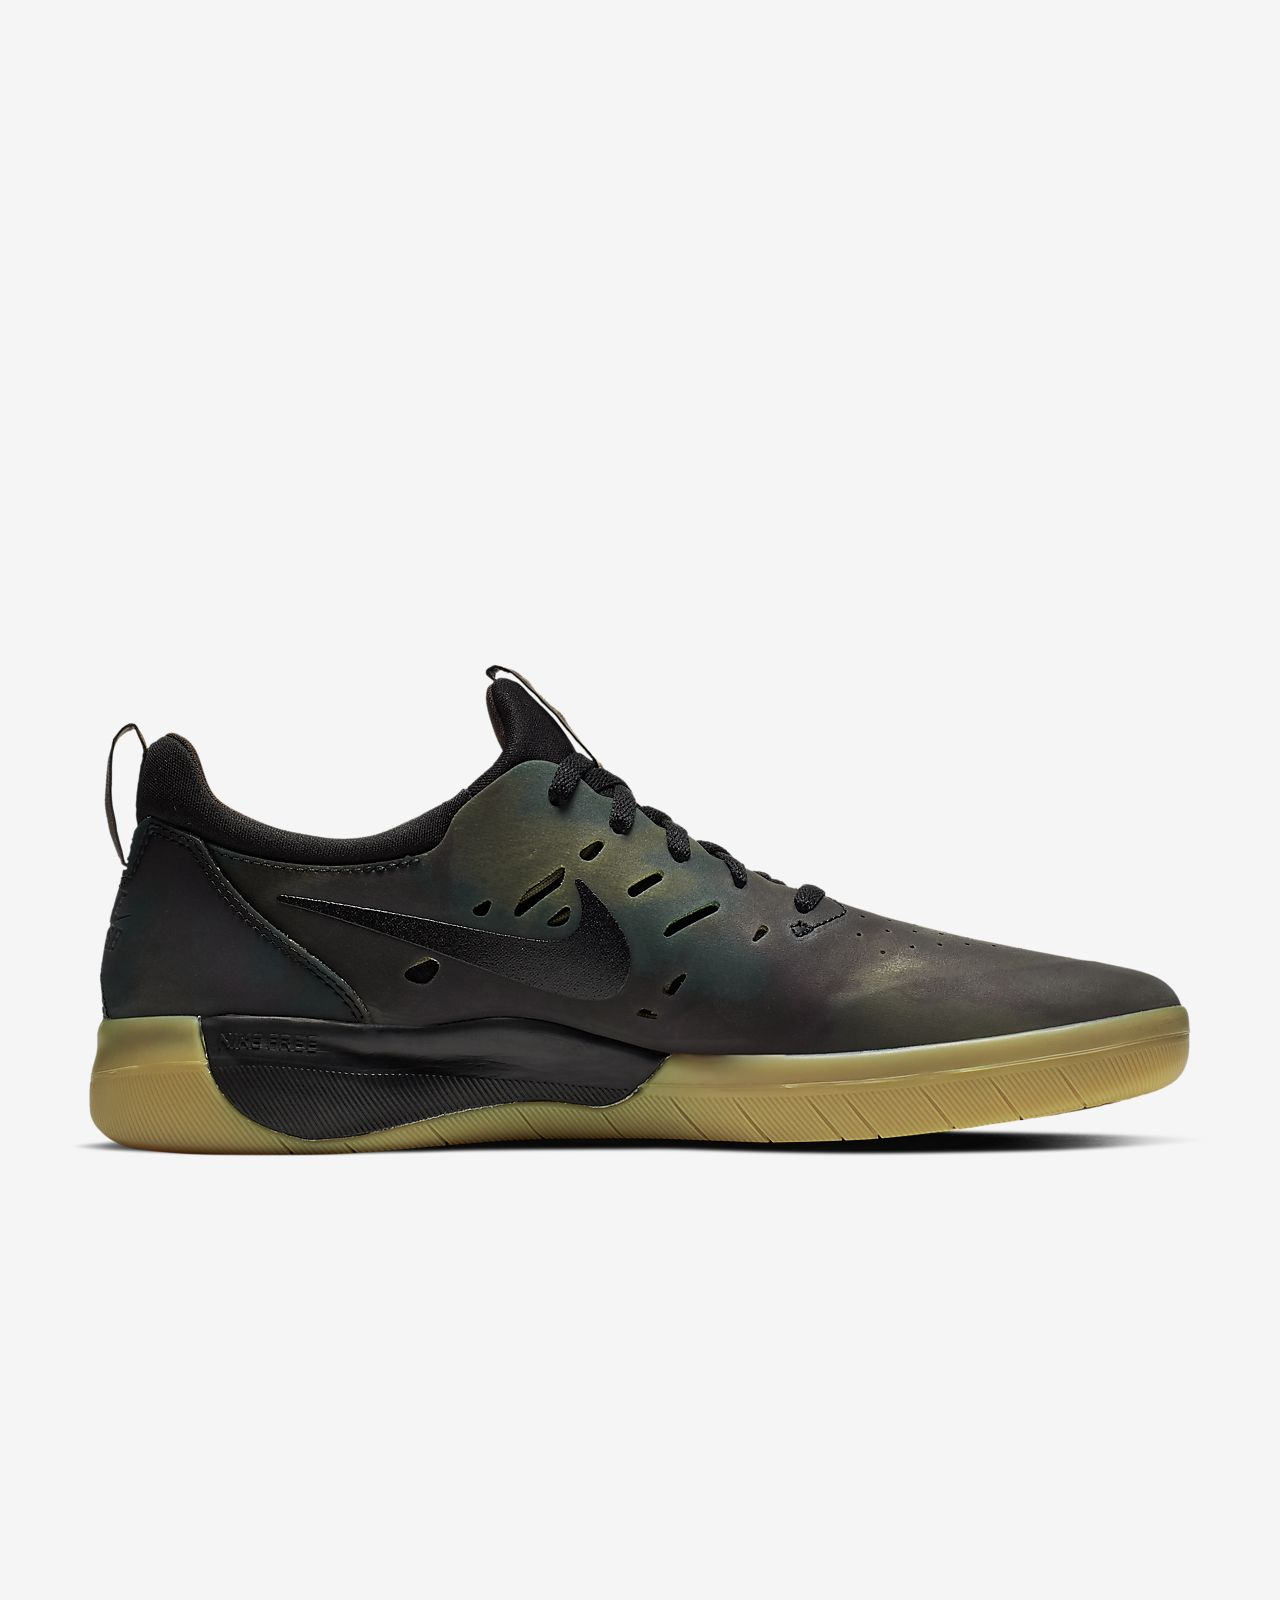 Nike SB Nyjah Free Premium Skateboardschuh